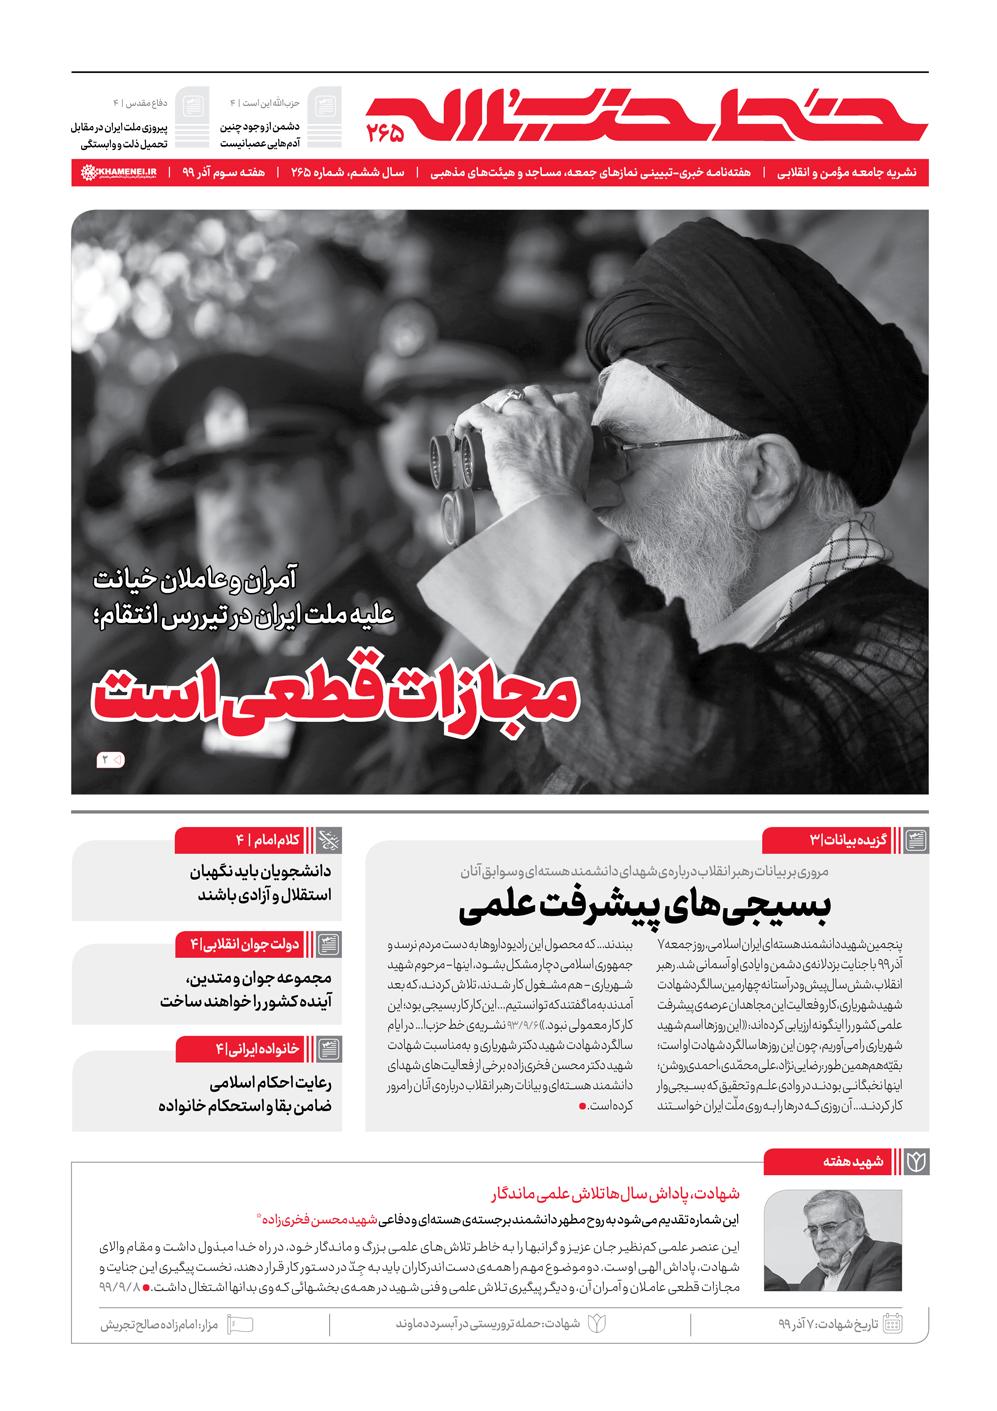 13990913000603 Test NewPhotoFree - خط حزبالله ۲۶۵ | مجازات قطعی است